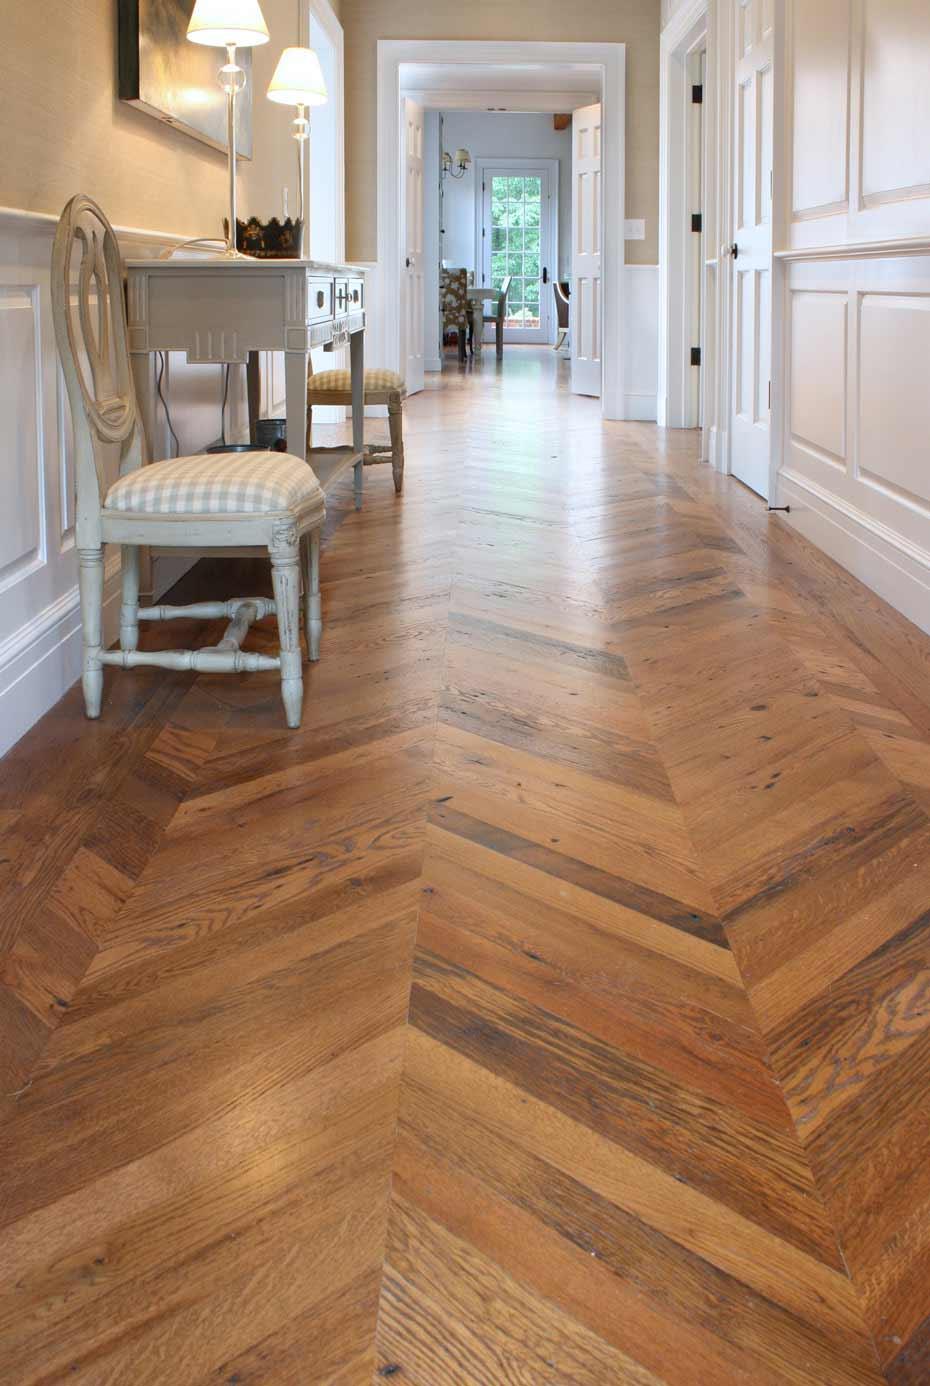 Custom Patterned Flooring - Mountain Lumber Company